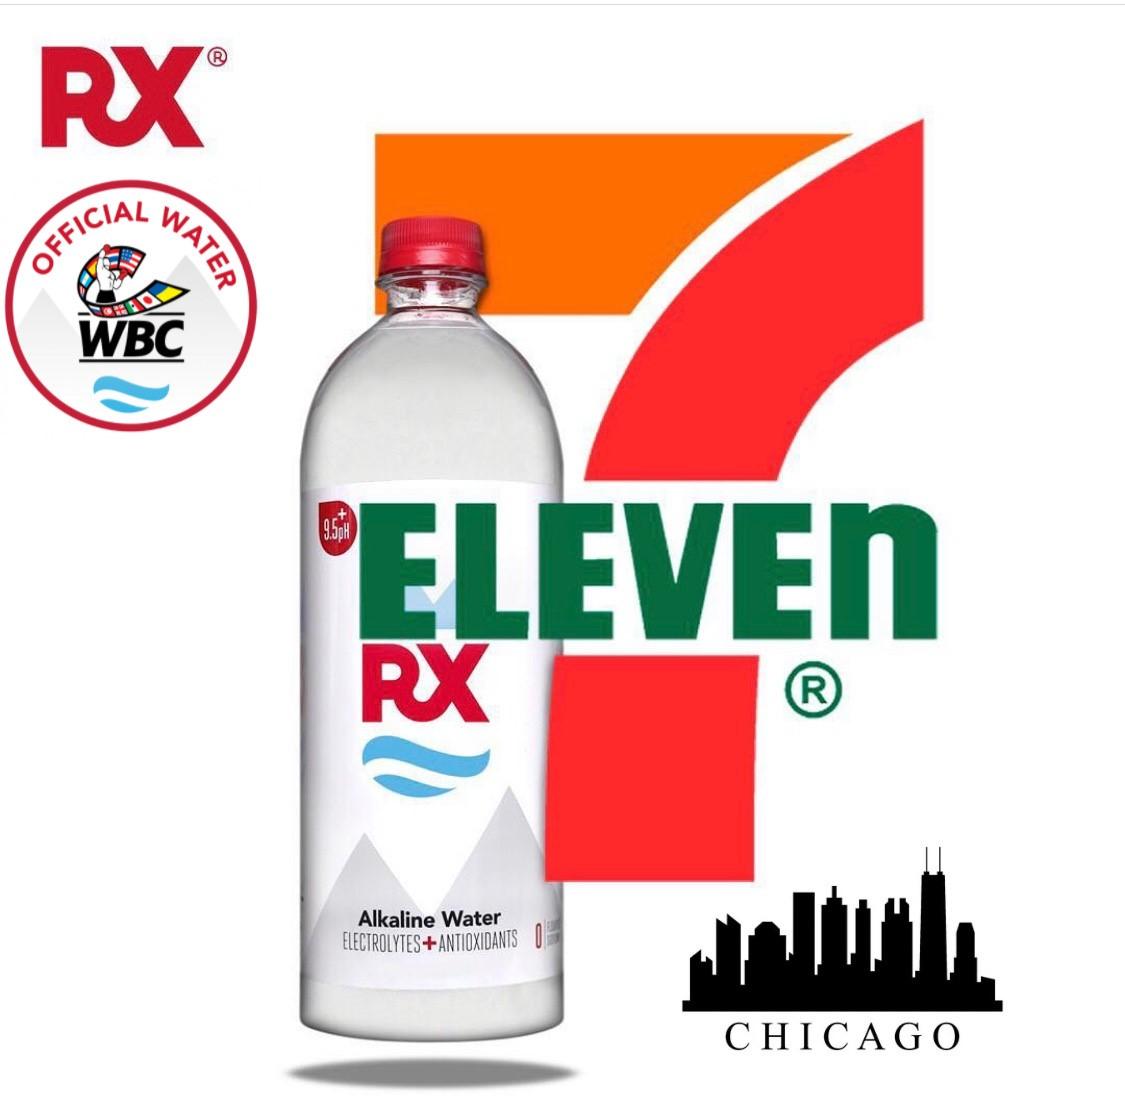 http://suljosblog.com/suljos/wp-content/uploads/2020/07/chicago-rx.jpg